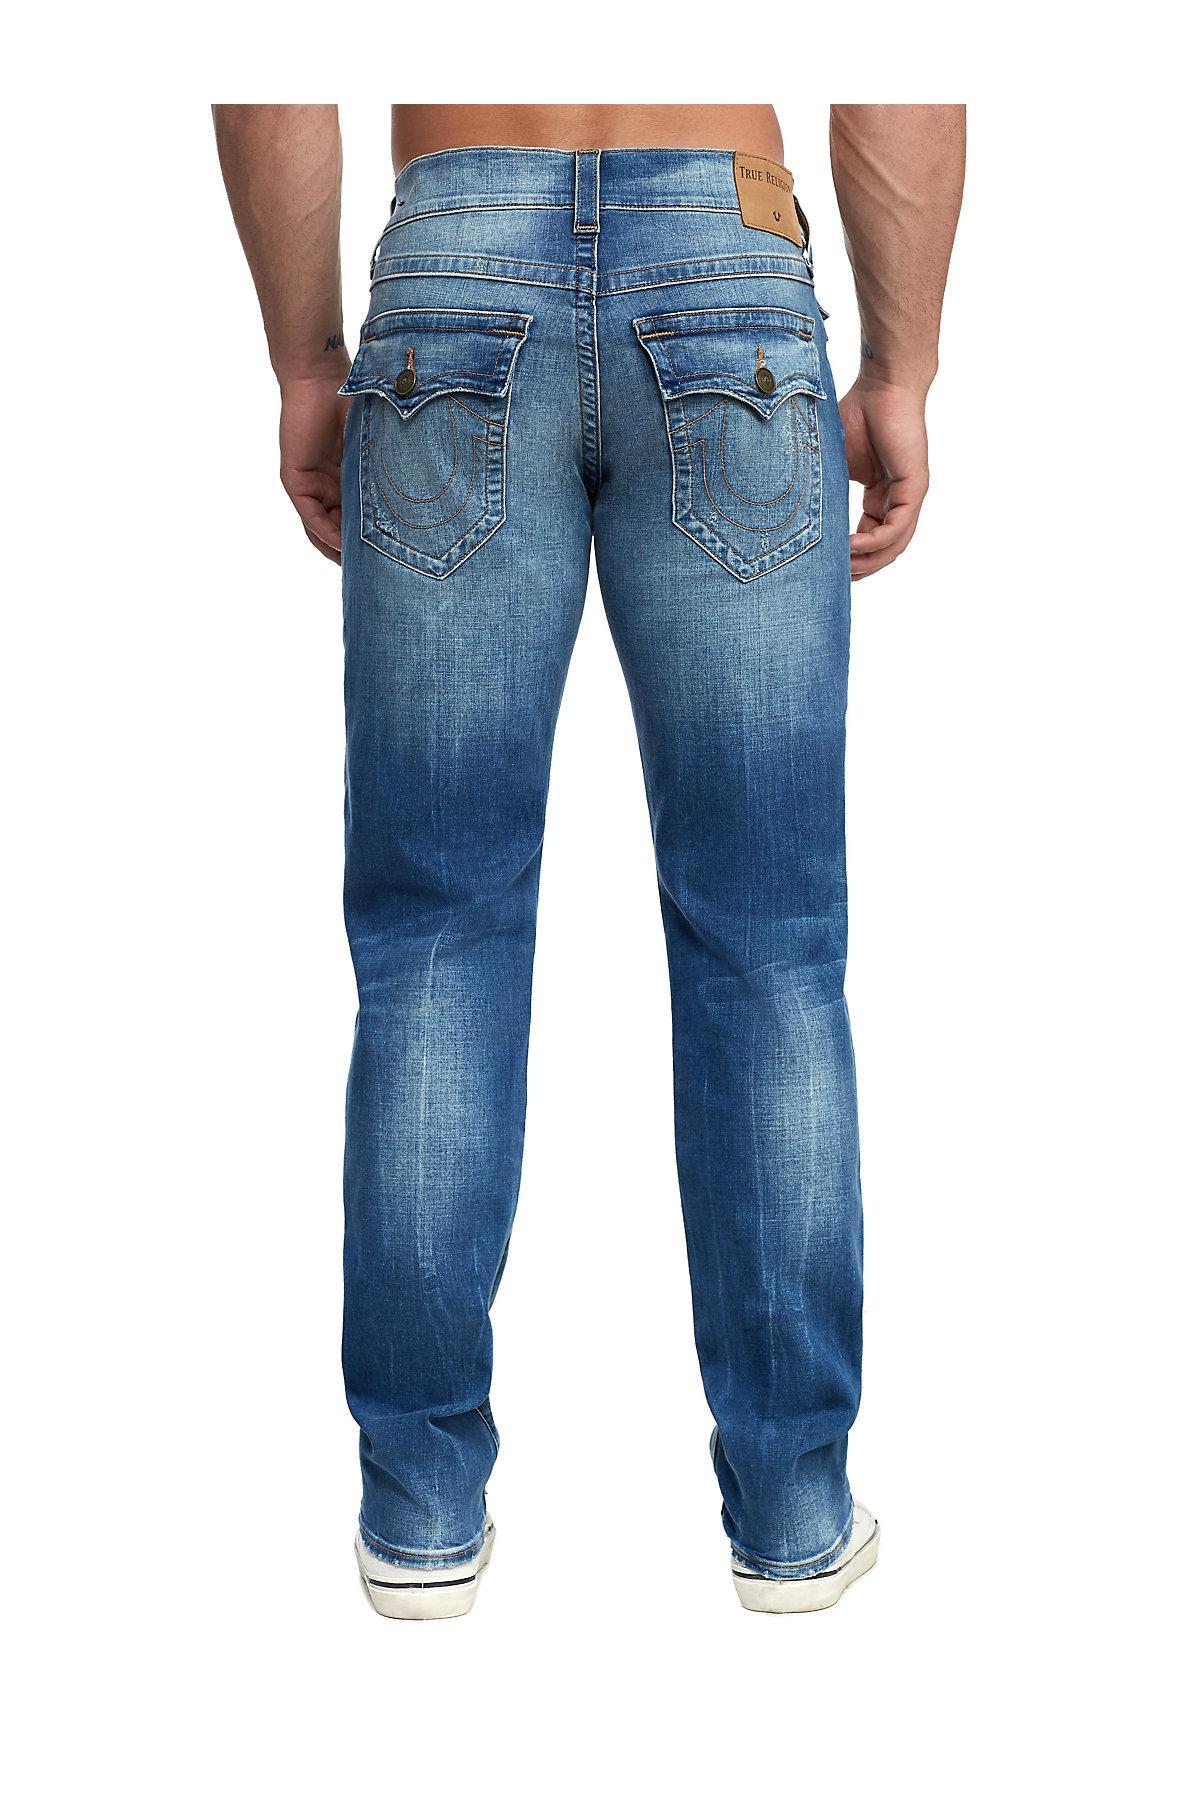 1f32a0eec True Religion - Blue Distressed Geno Slim Jean W  Flap for Men - Lyst. View  fullscreen